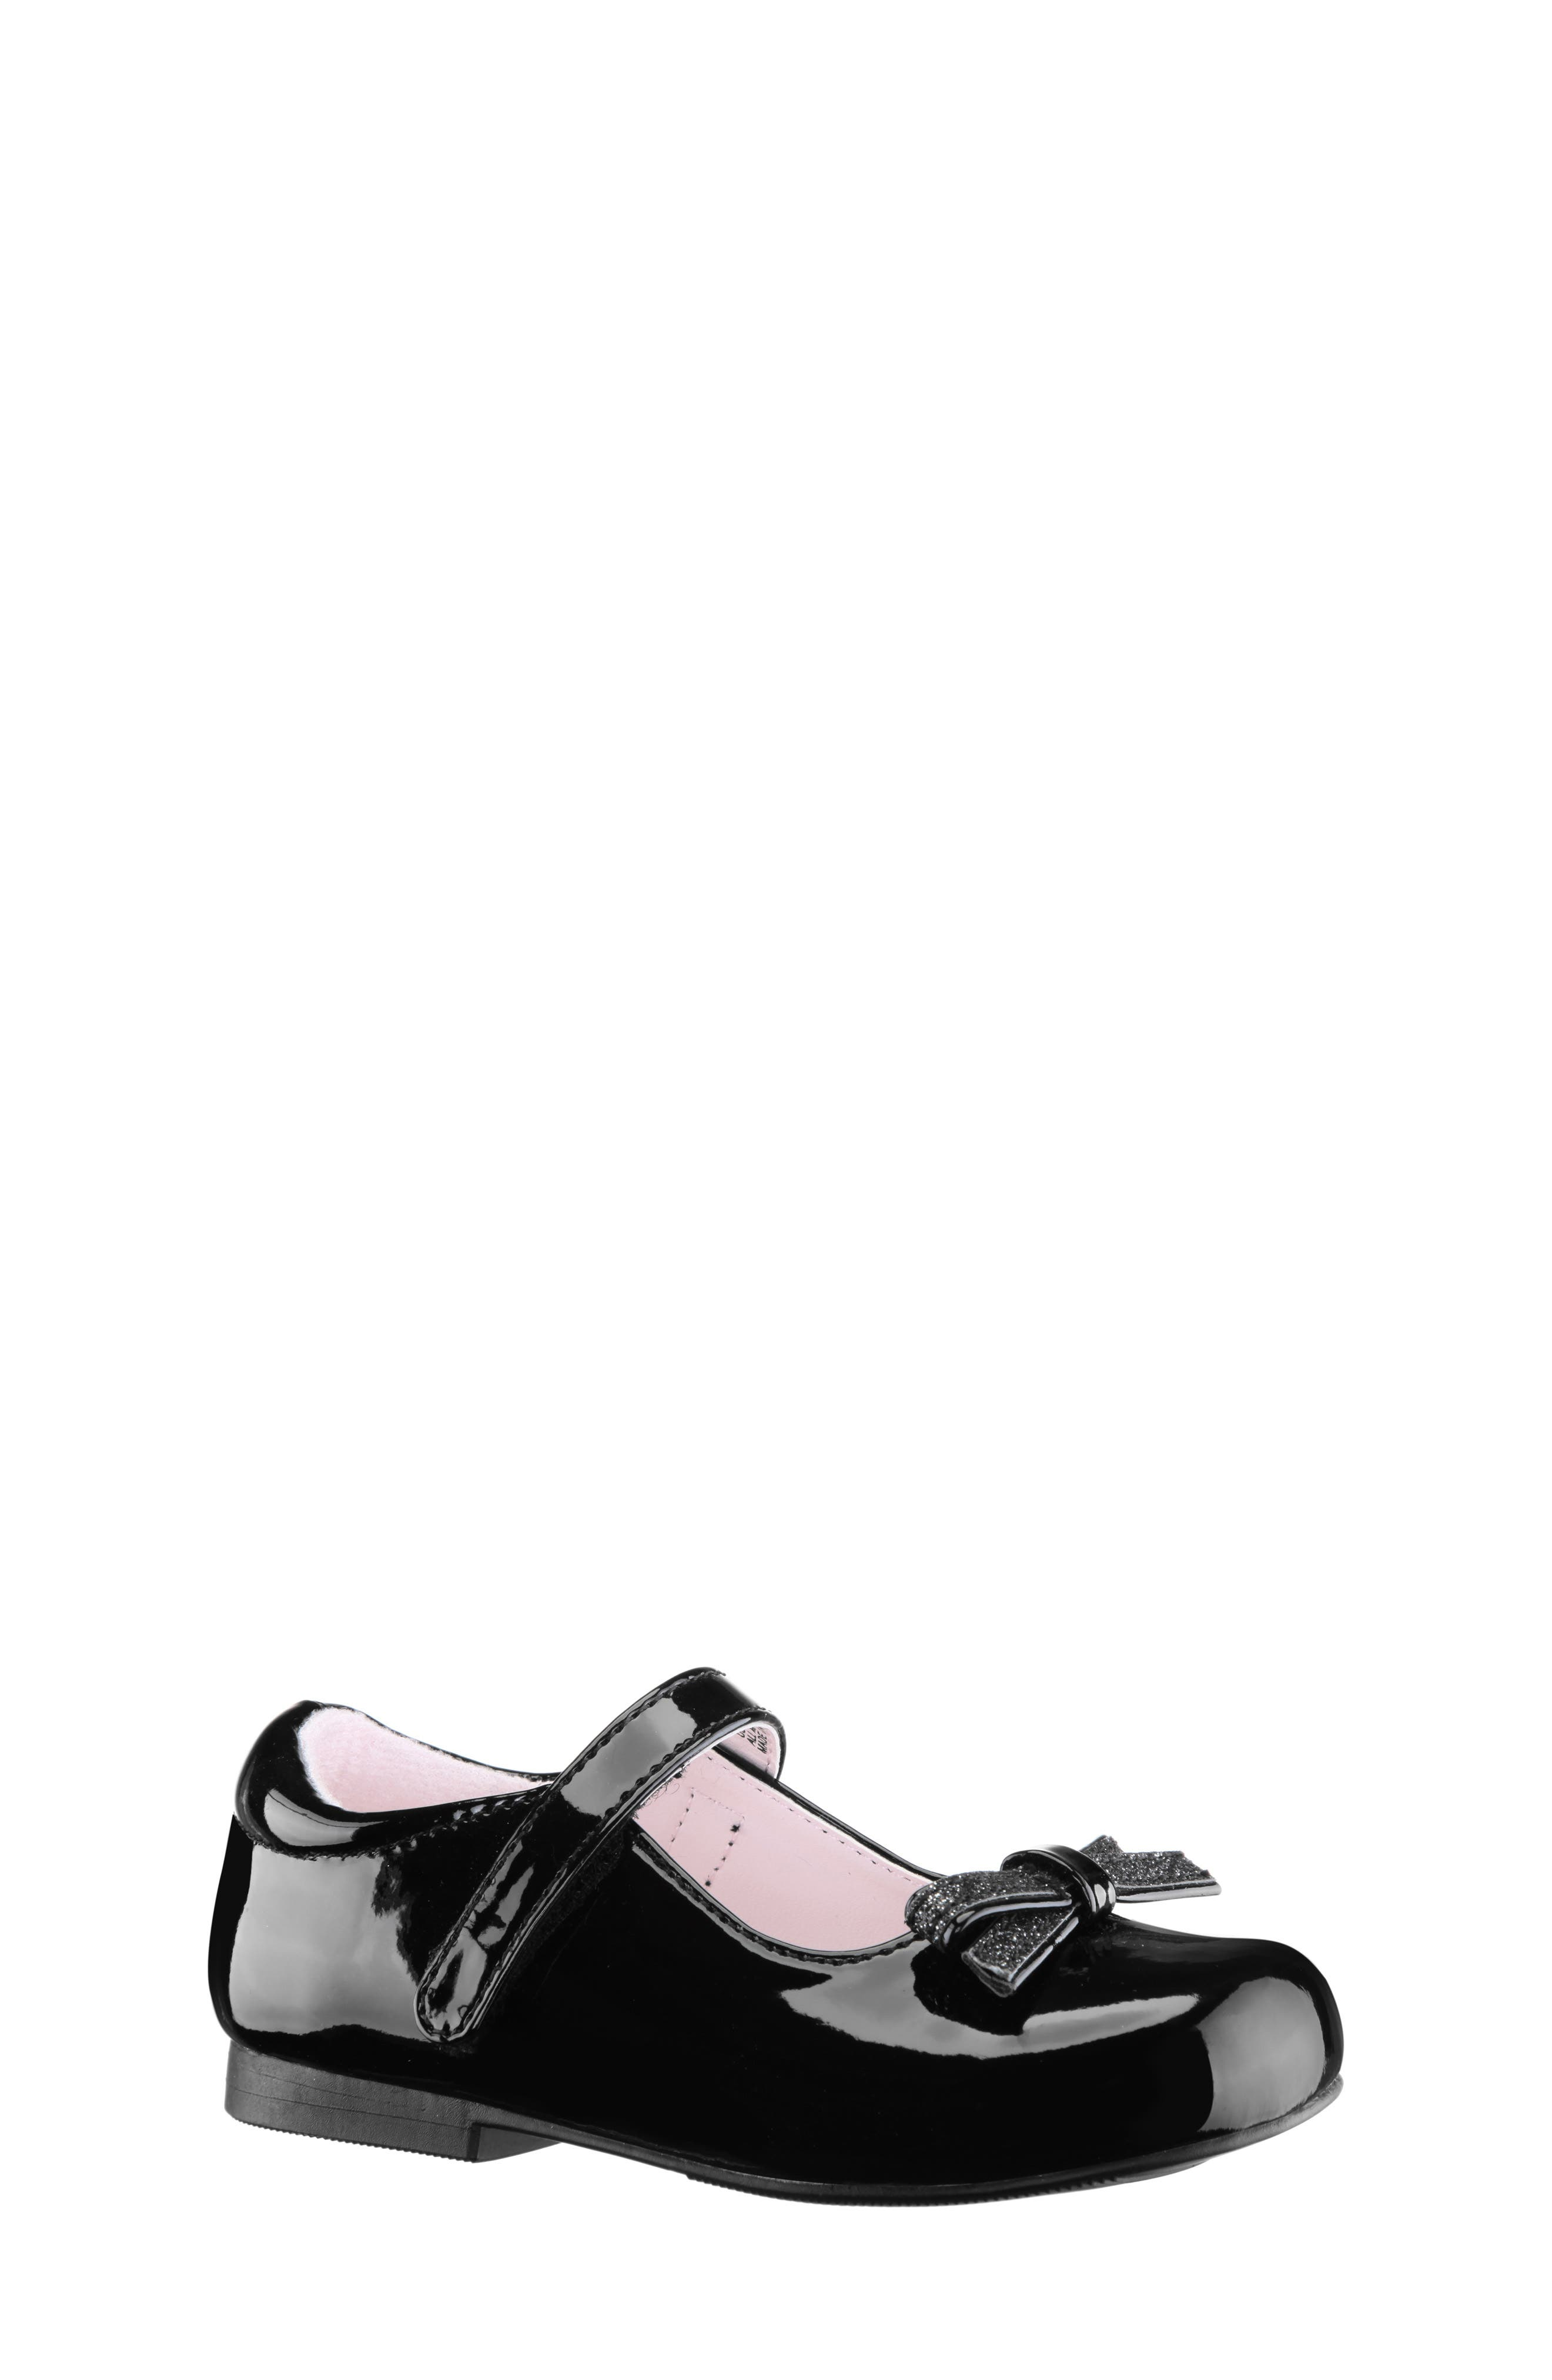 Toddler Girls Nina Christin Glitter Bow Mary Jane Size 8 M  Black